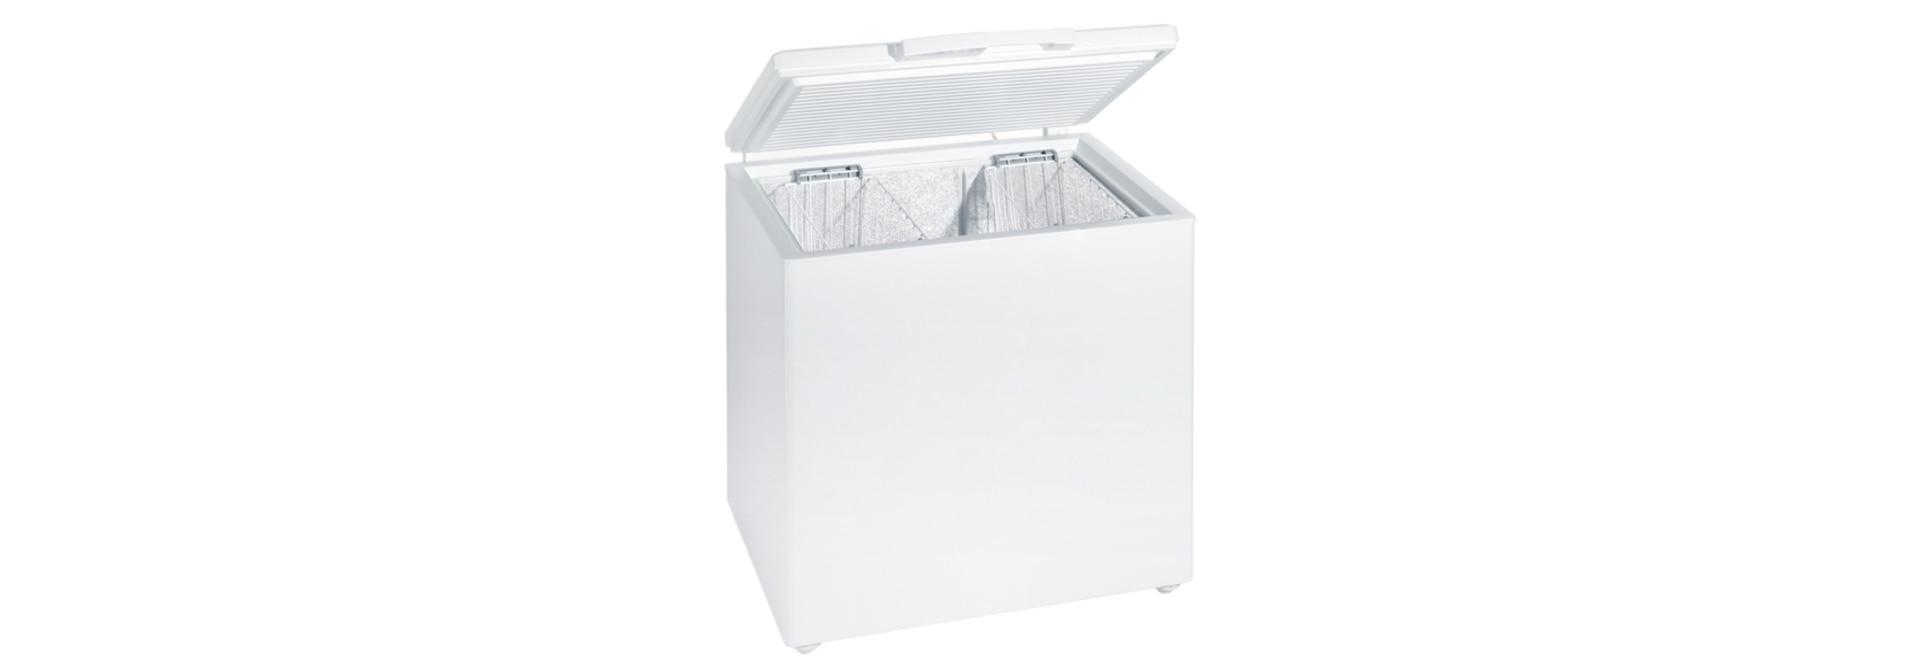 Congeladores -45°C del pecho de la baja temperatura